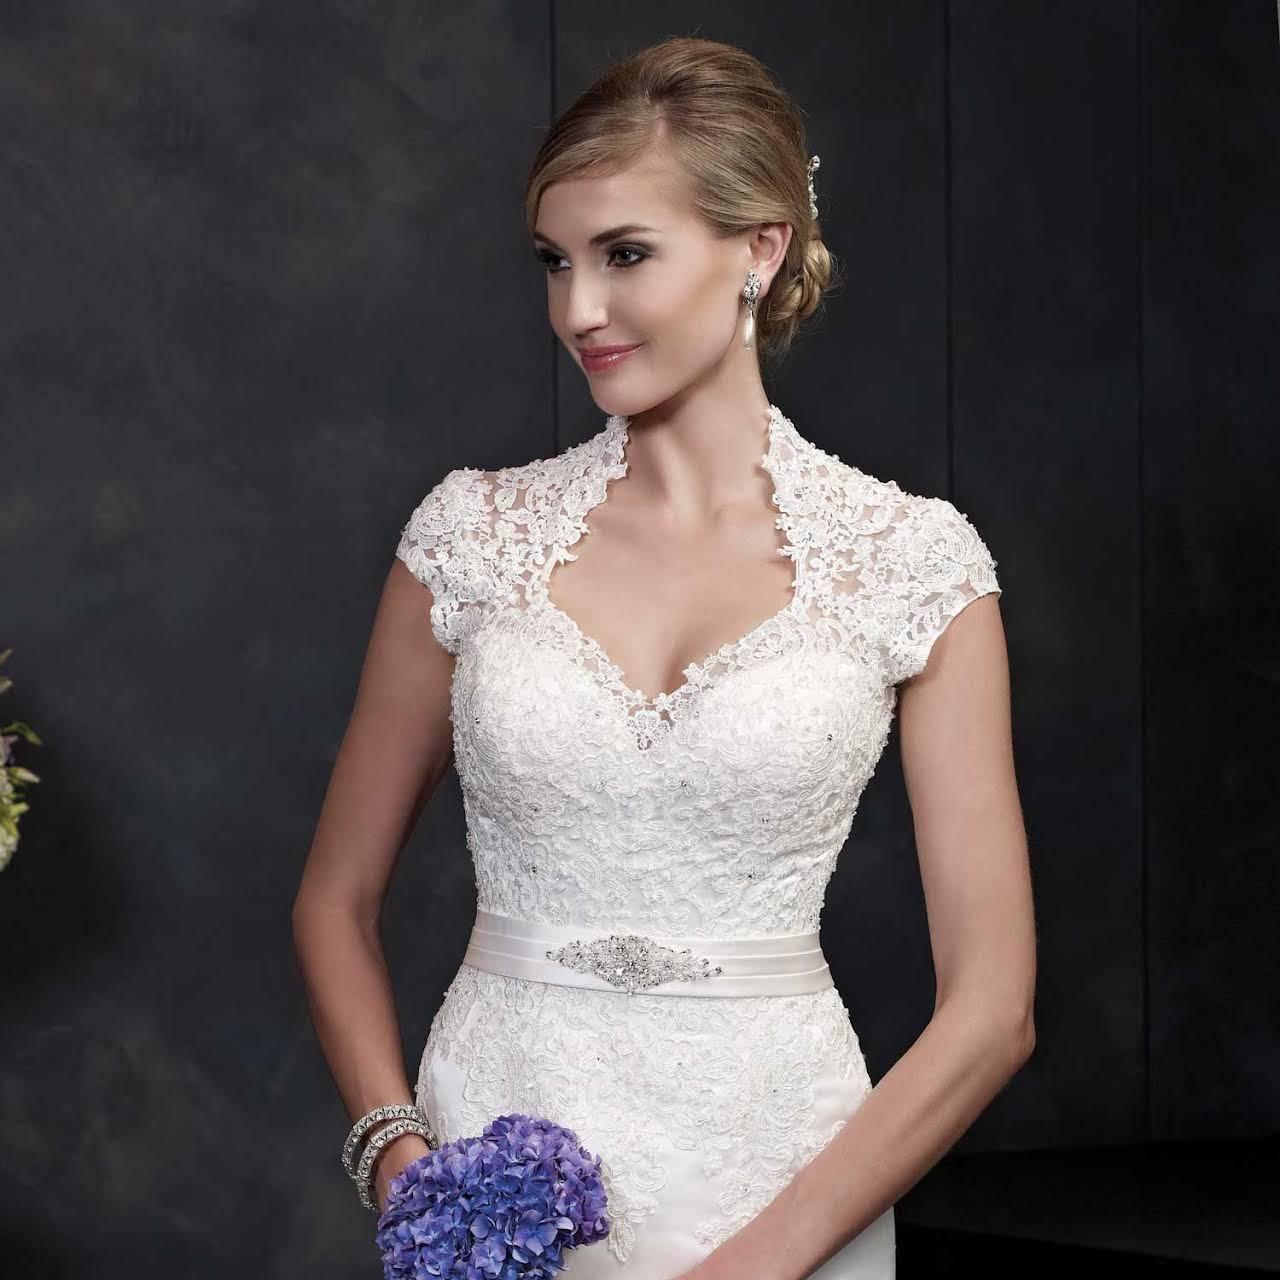 e7e3db8b4b56 Bellisima Bridal Boutique - Online Bridal Boutique based in Woodland  bellisima bridal boutique woodland ca